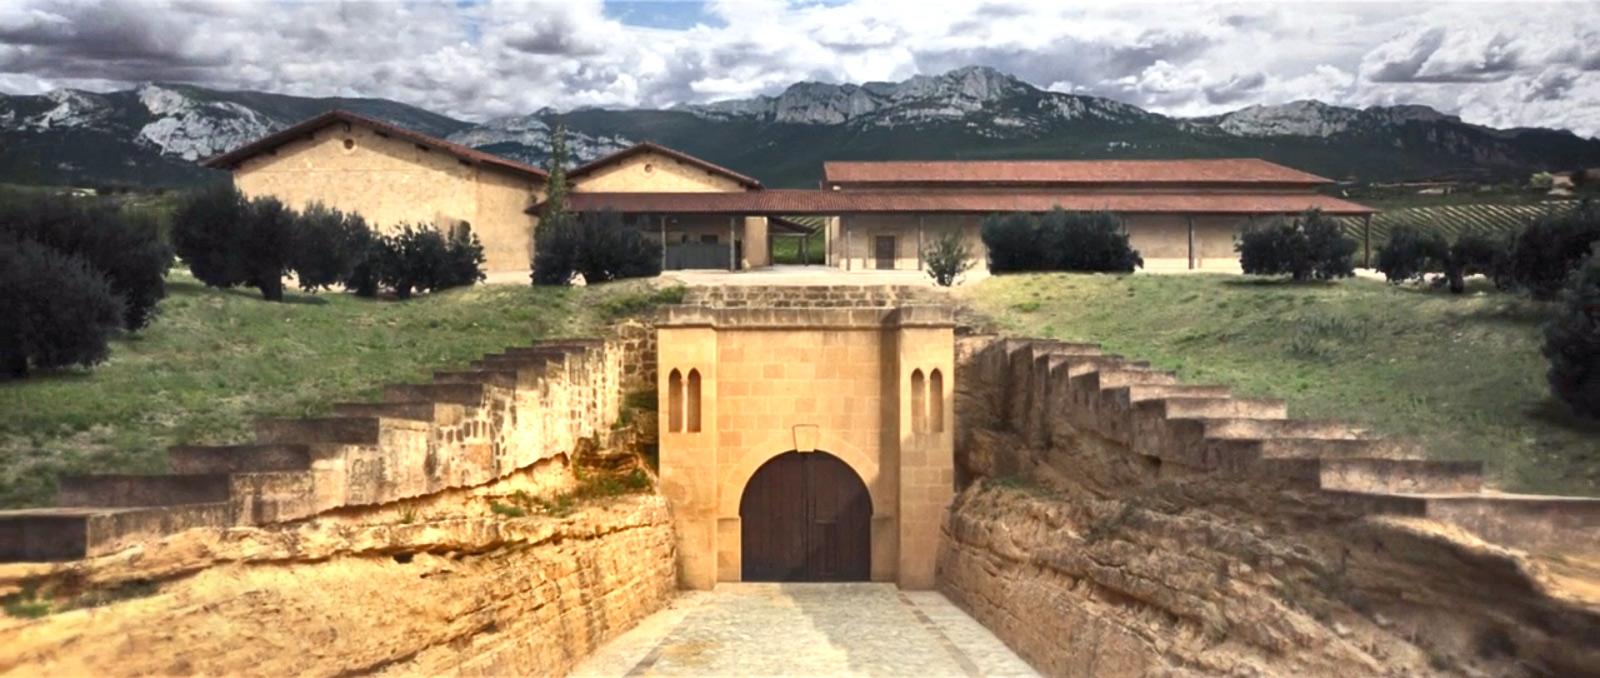 caves et vignobles sierra cantabria